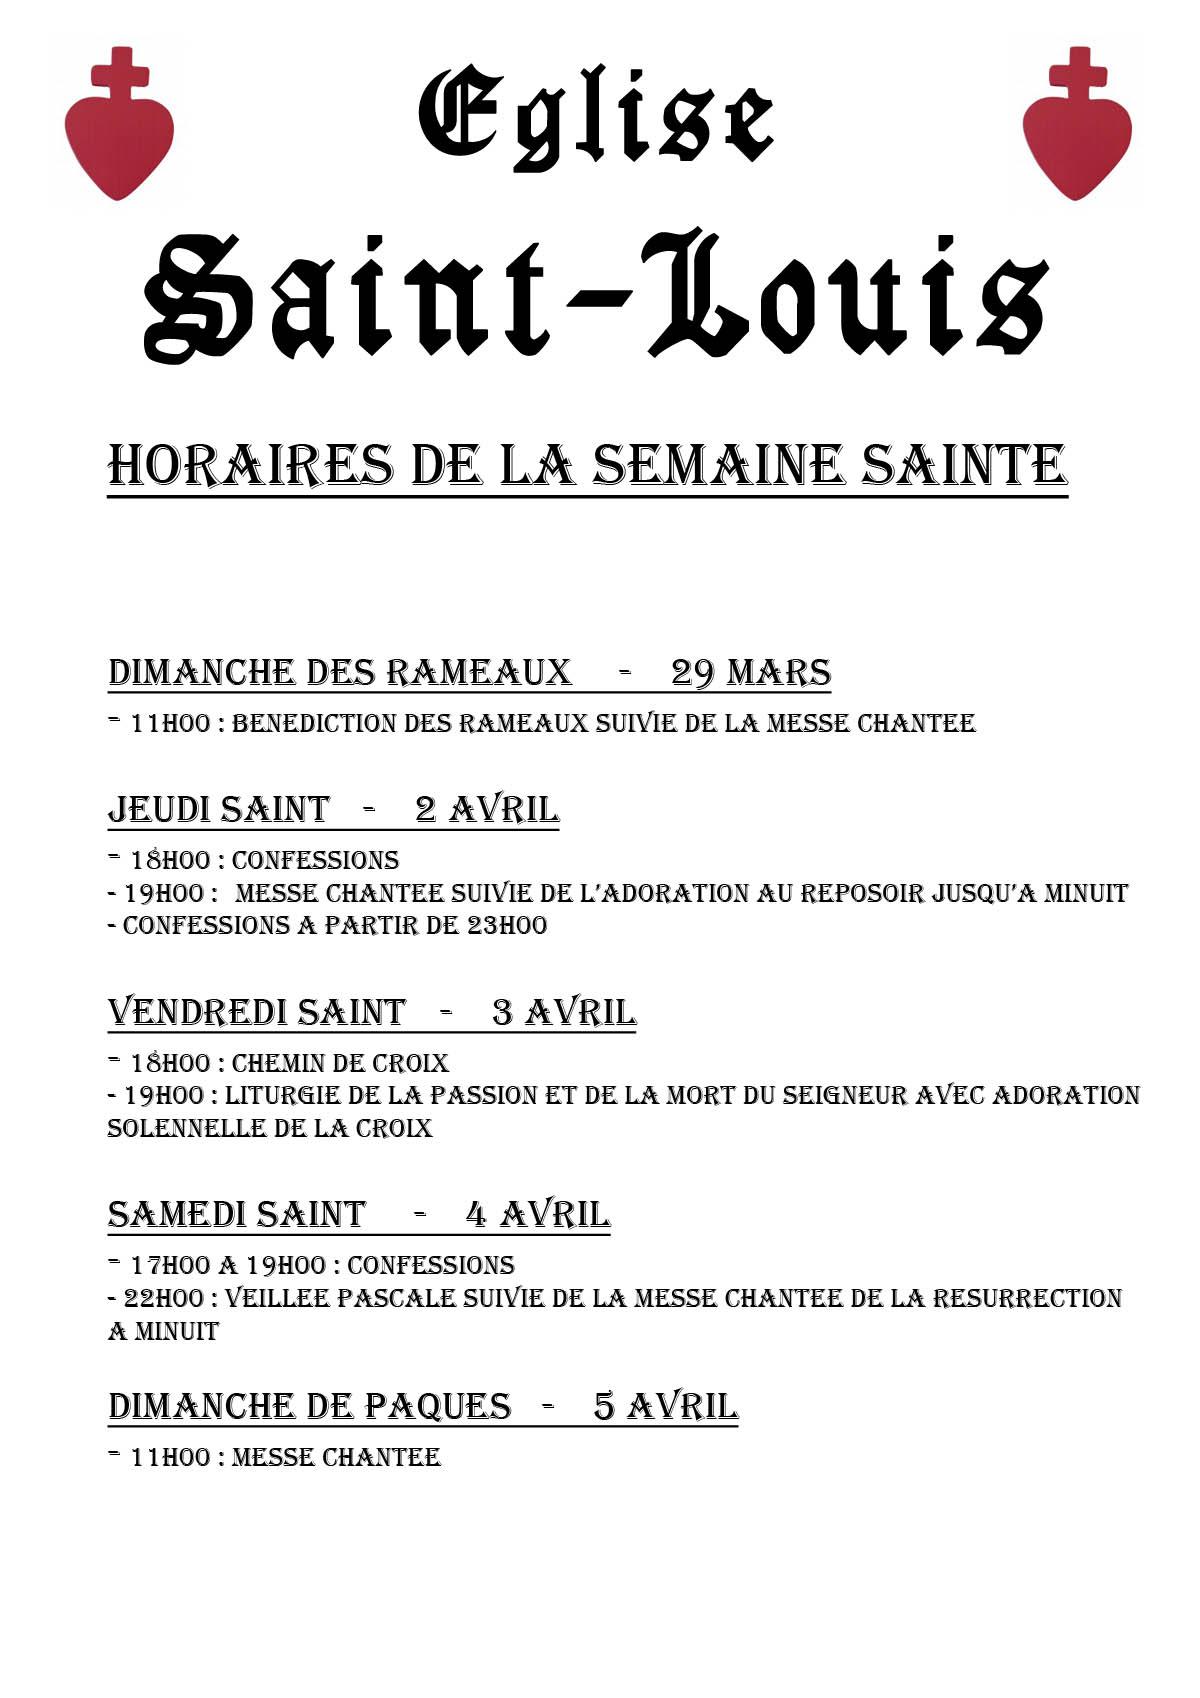 Programme semaine sainte 2015